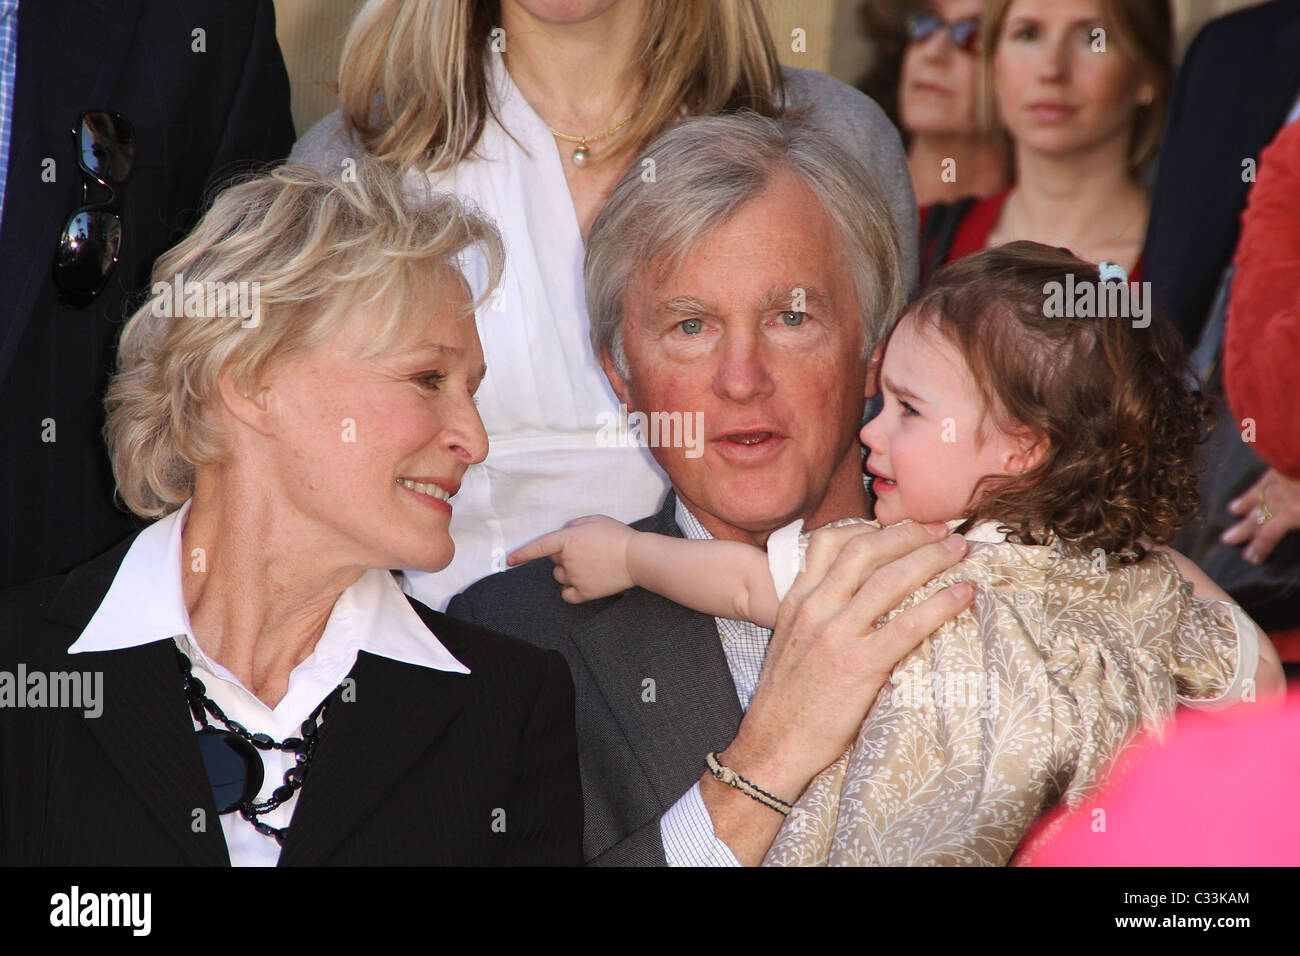 glenn close husband david shaw and granddaughter glenn